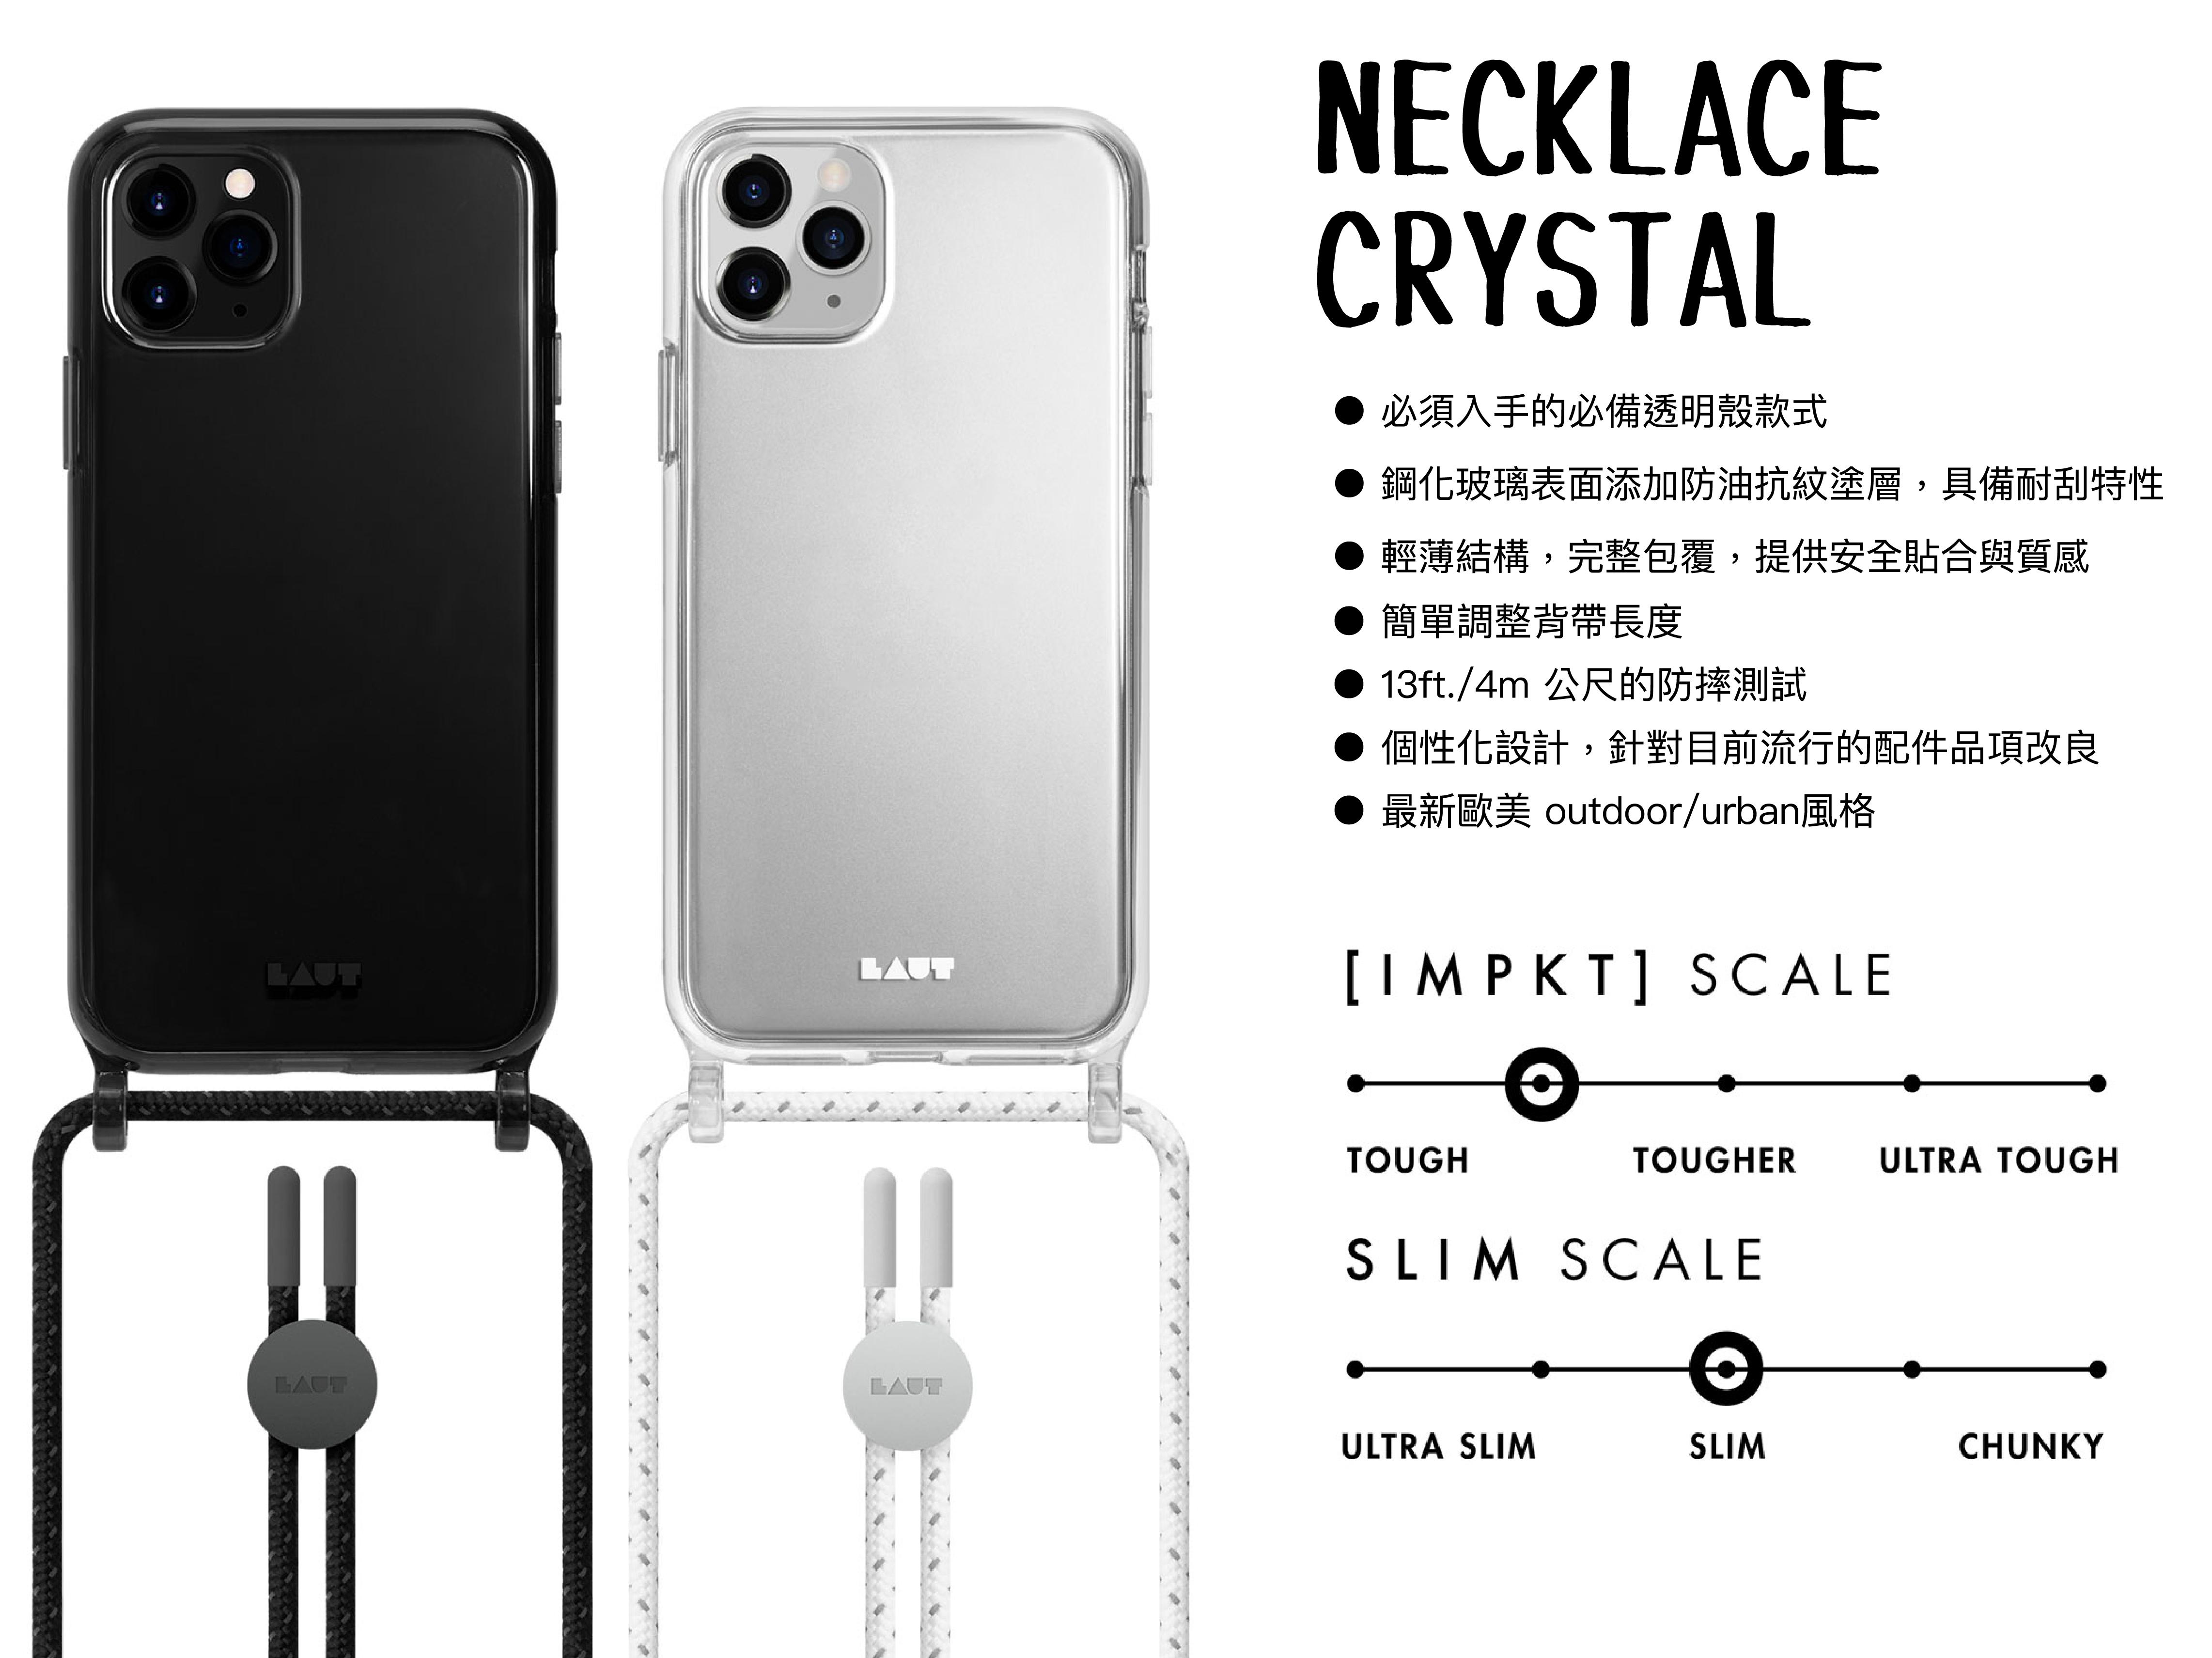 CRYSTAL-X系列 繩索背帶手機殼 的特點條列與防撞貼和指數